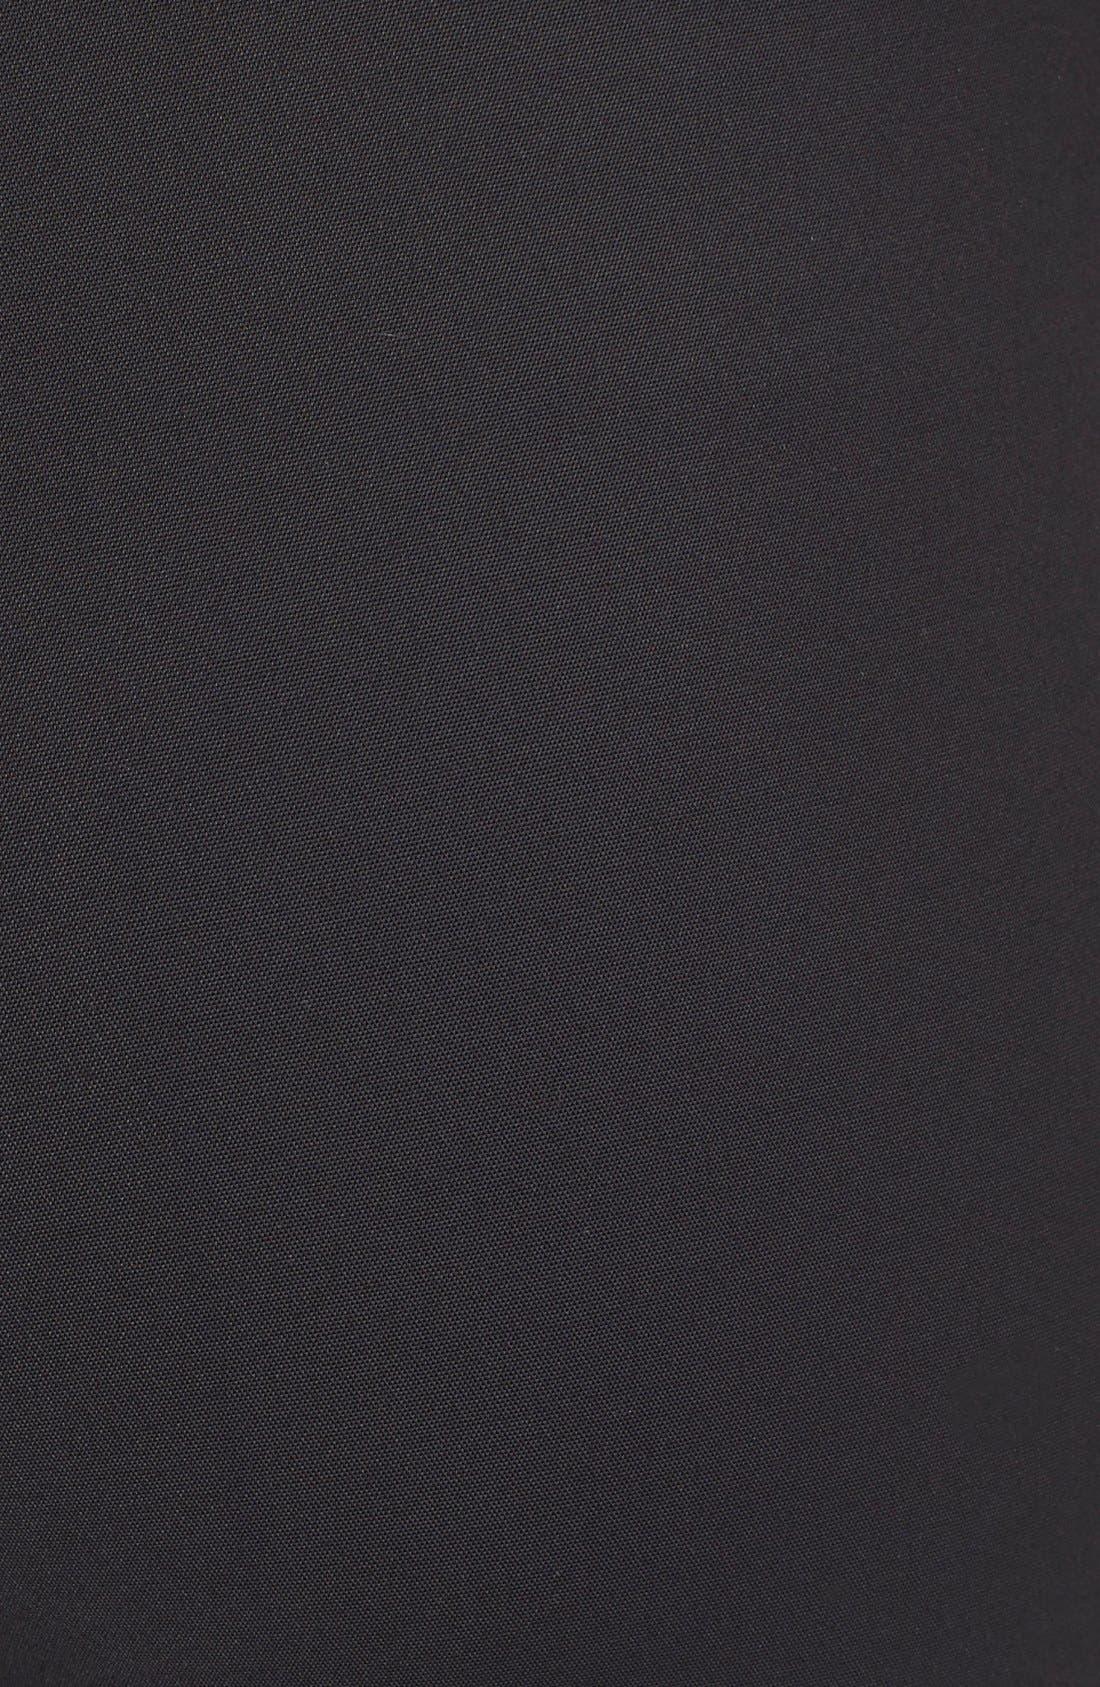 Alternate Image 3  - Akris punto 'Franca' Techno Cotton Pants